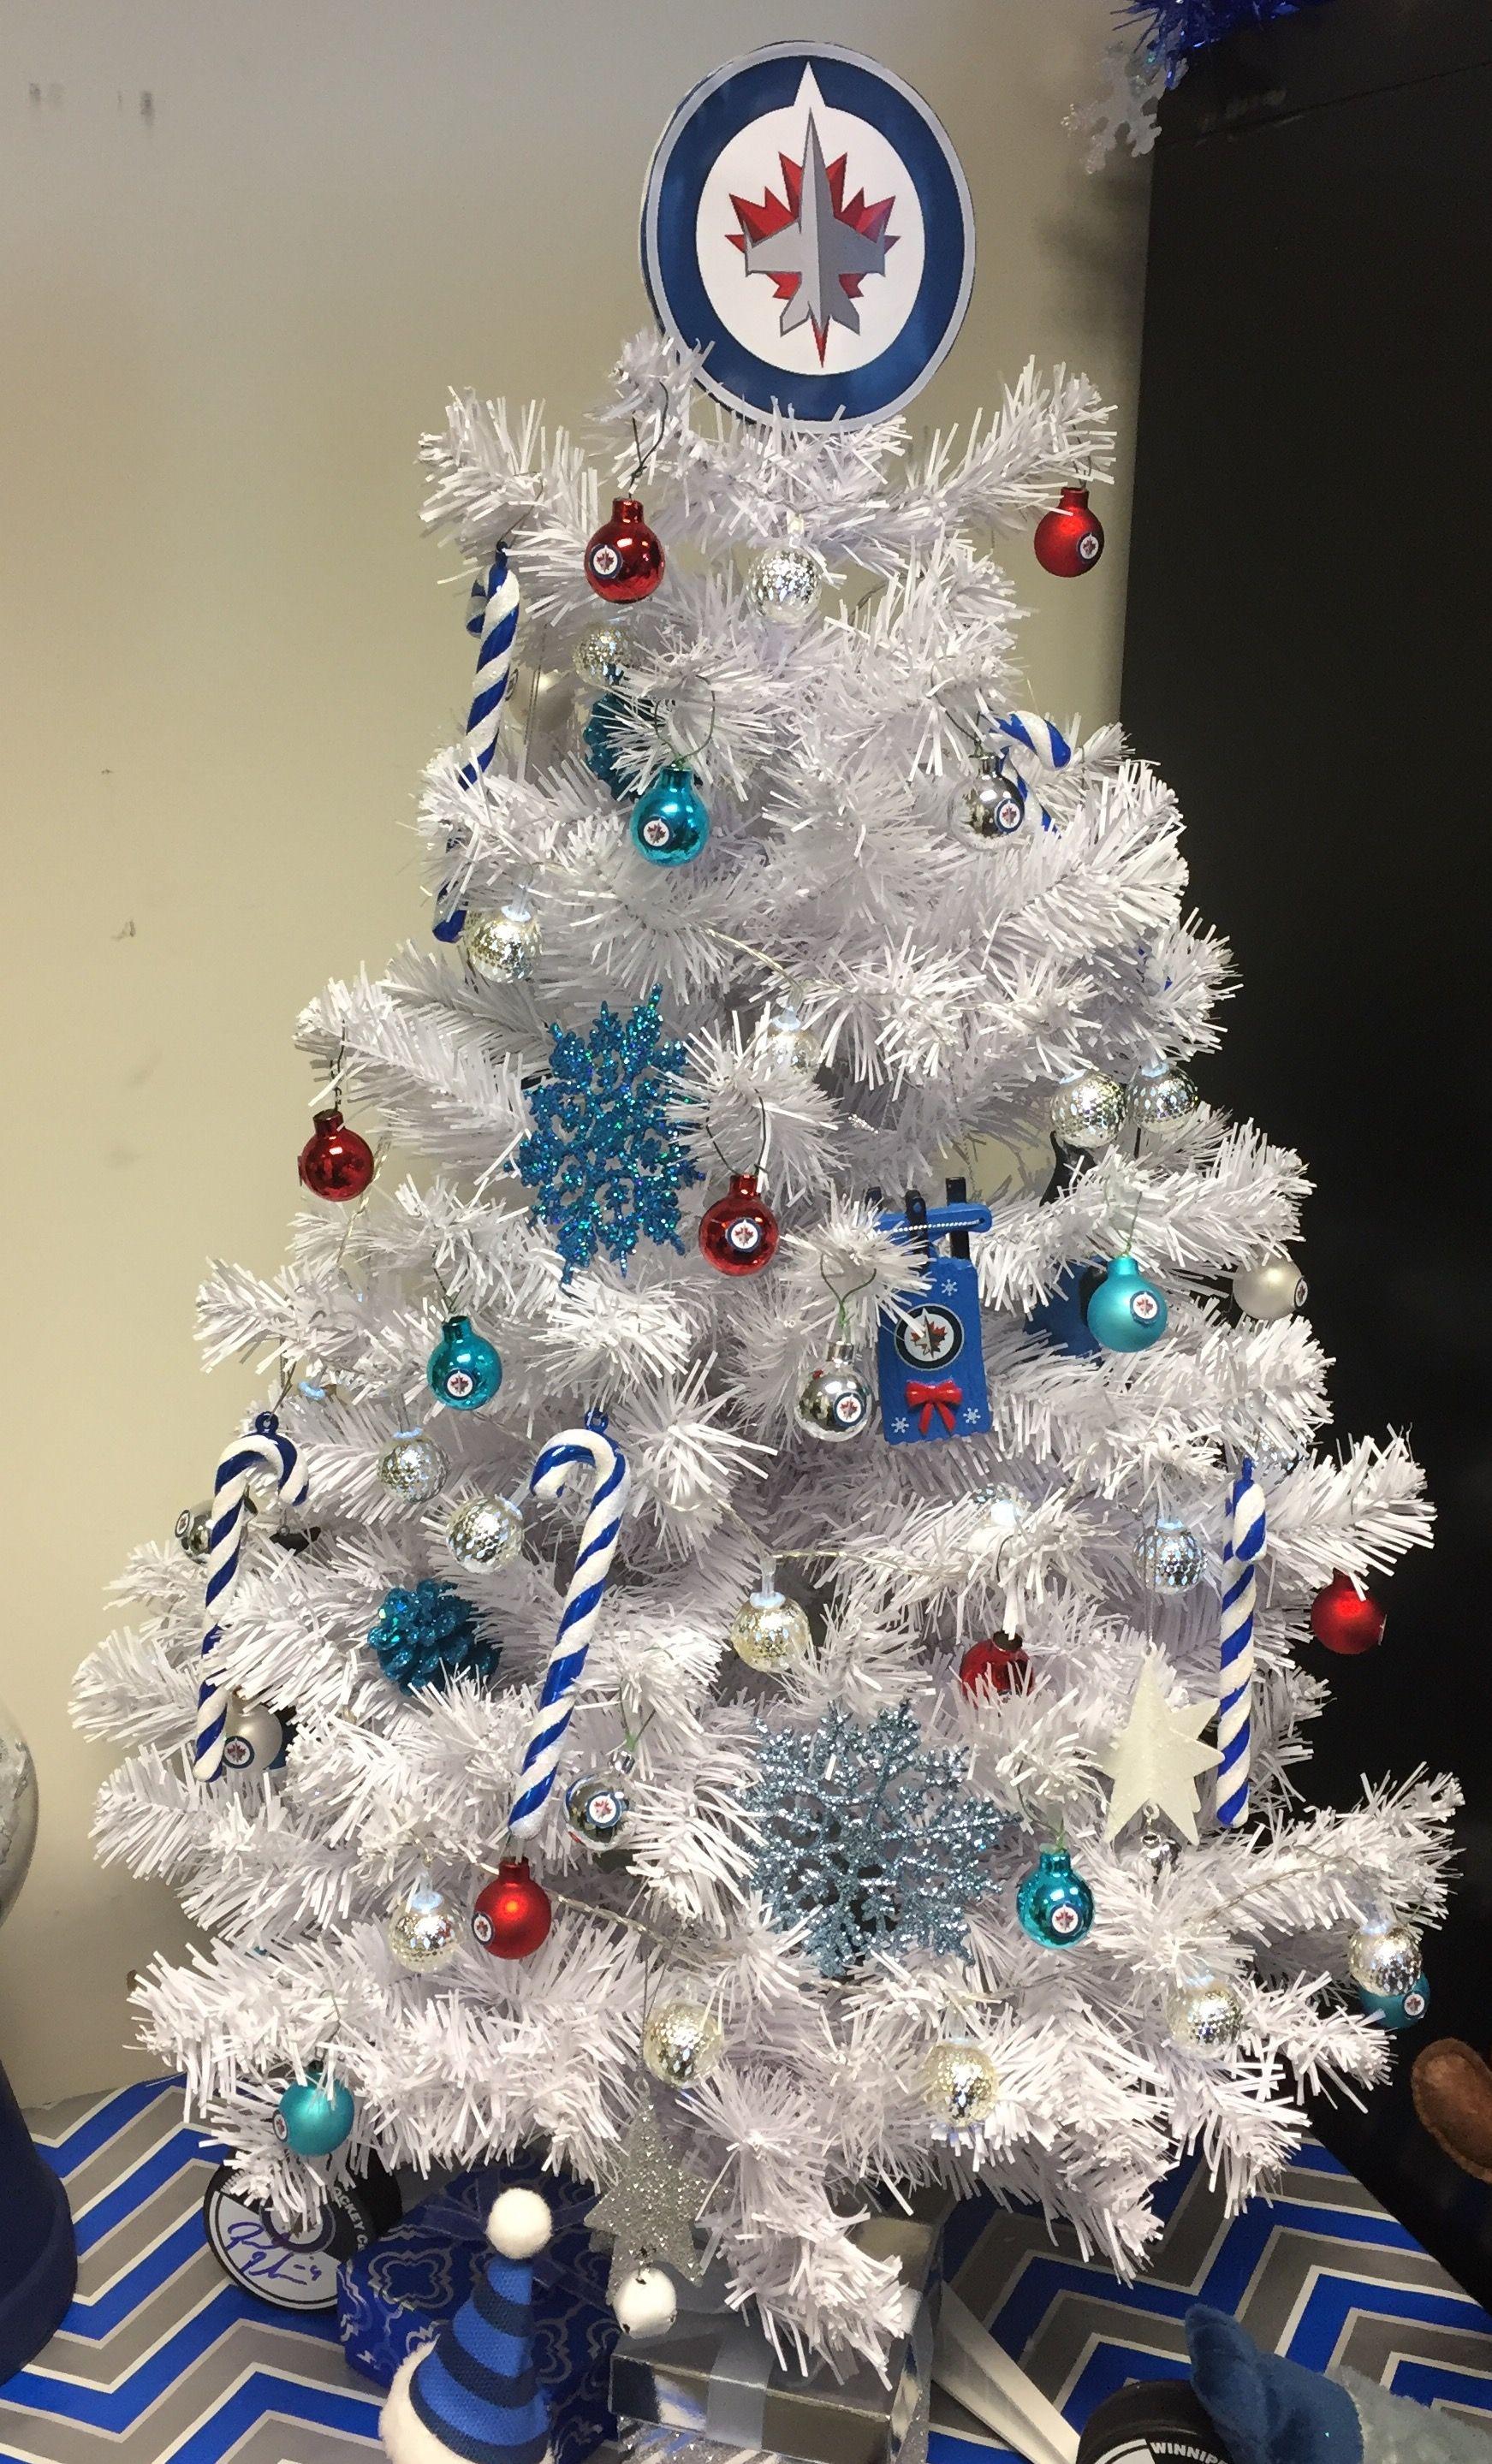 Winnipeg Jets Christmas Tree by Suzy Q